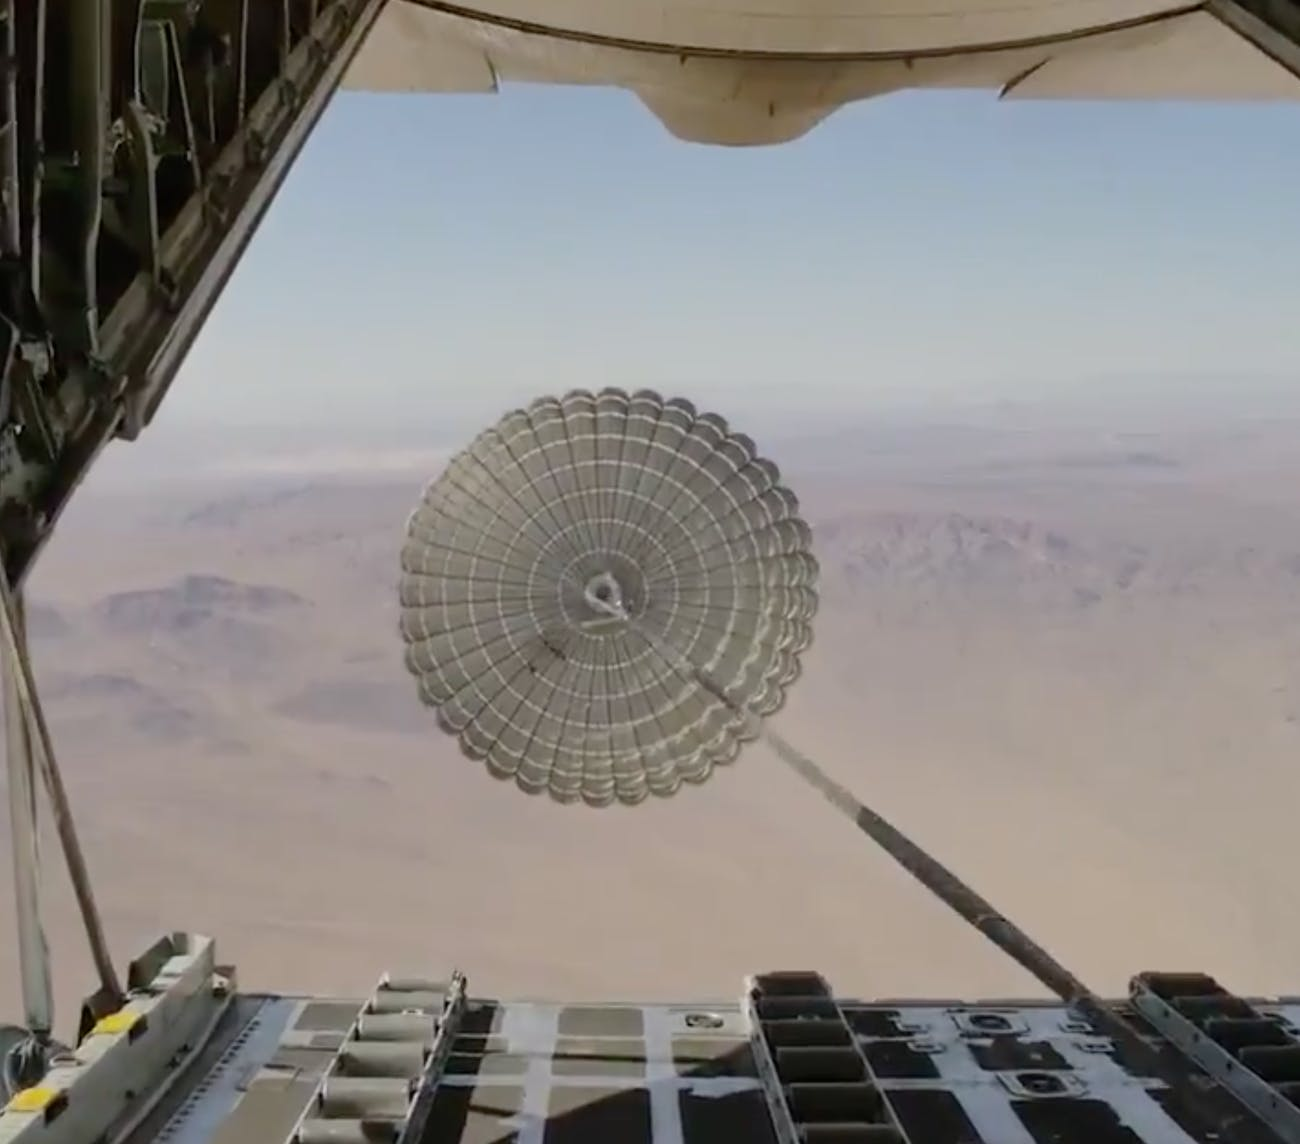 The xylon parachutes prepare for launch.